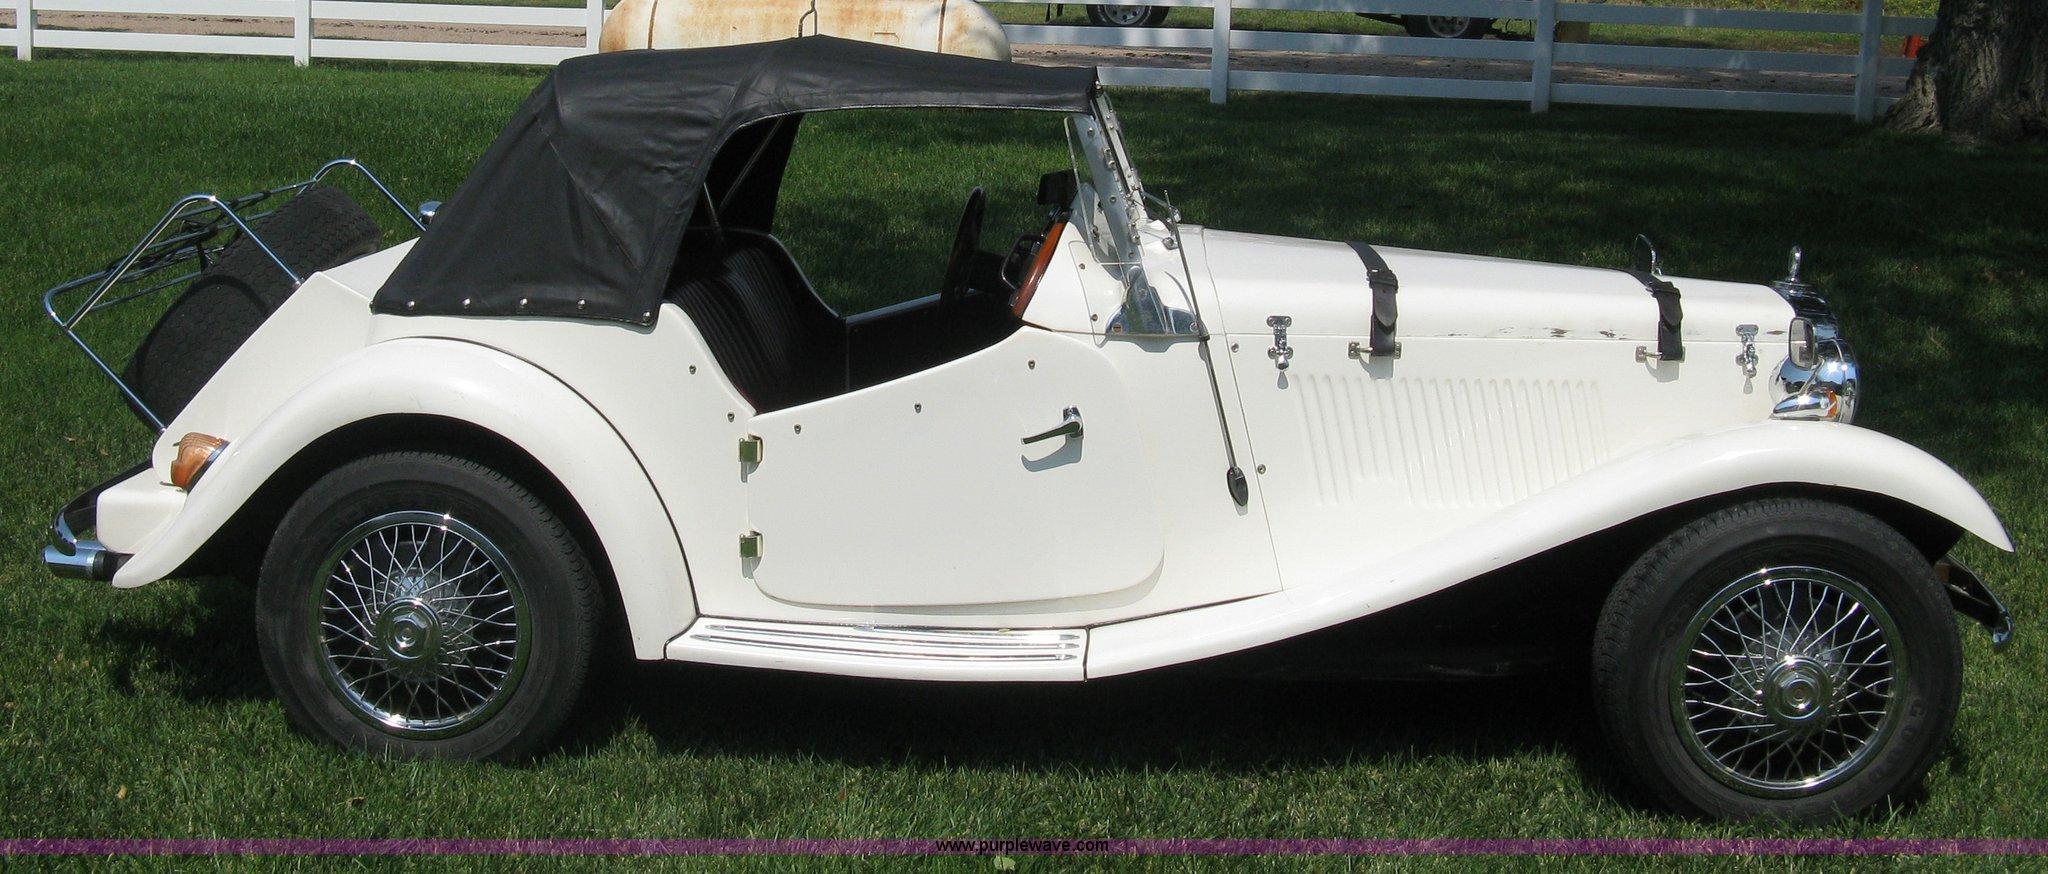 1988 1952 MG-TD replica kit car | Item B8070 | SOLD! Wednesd...